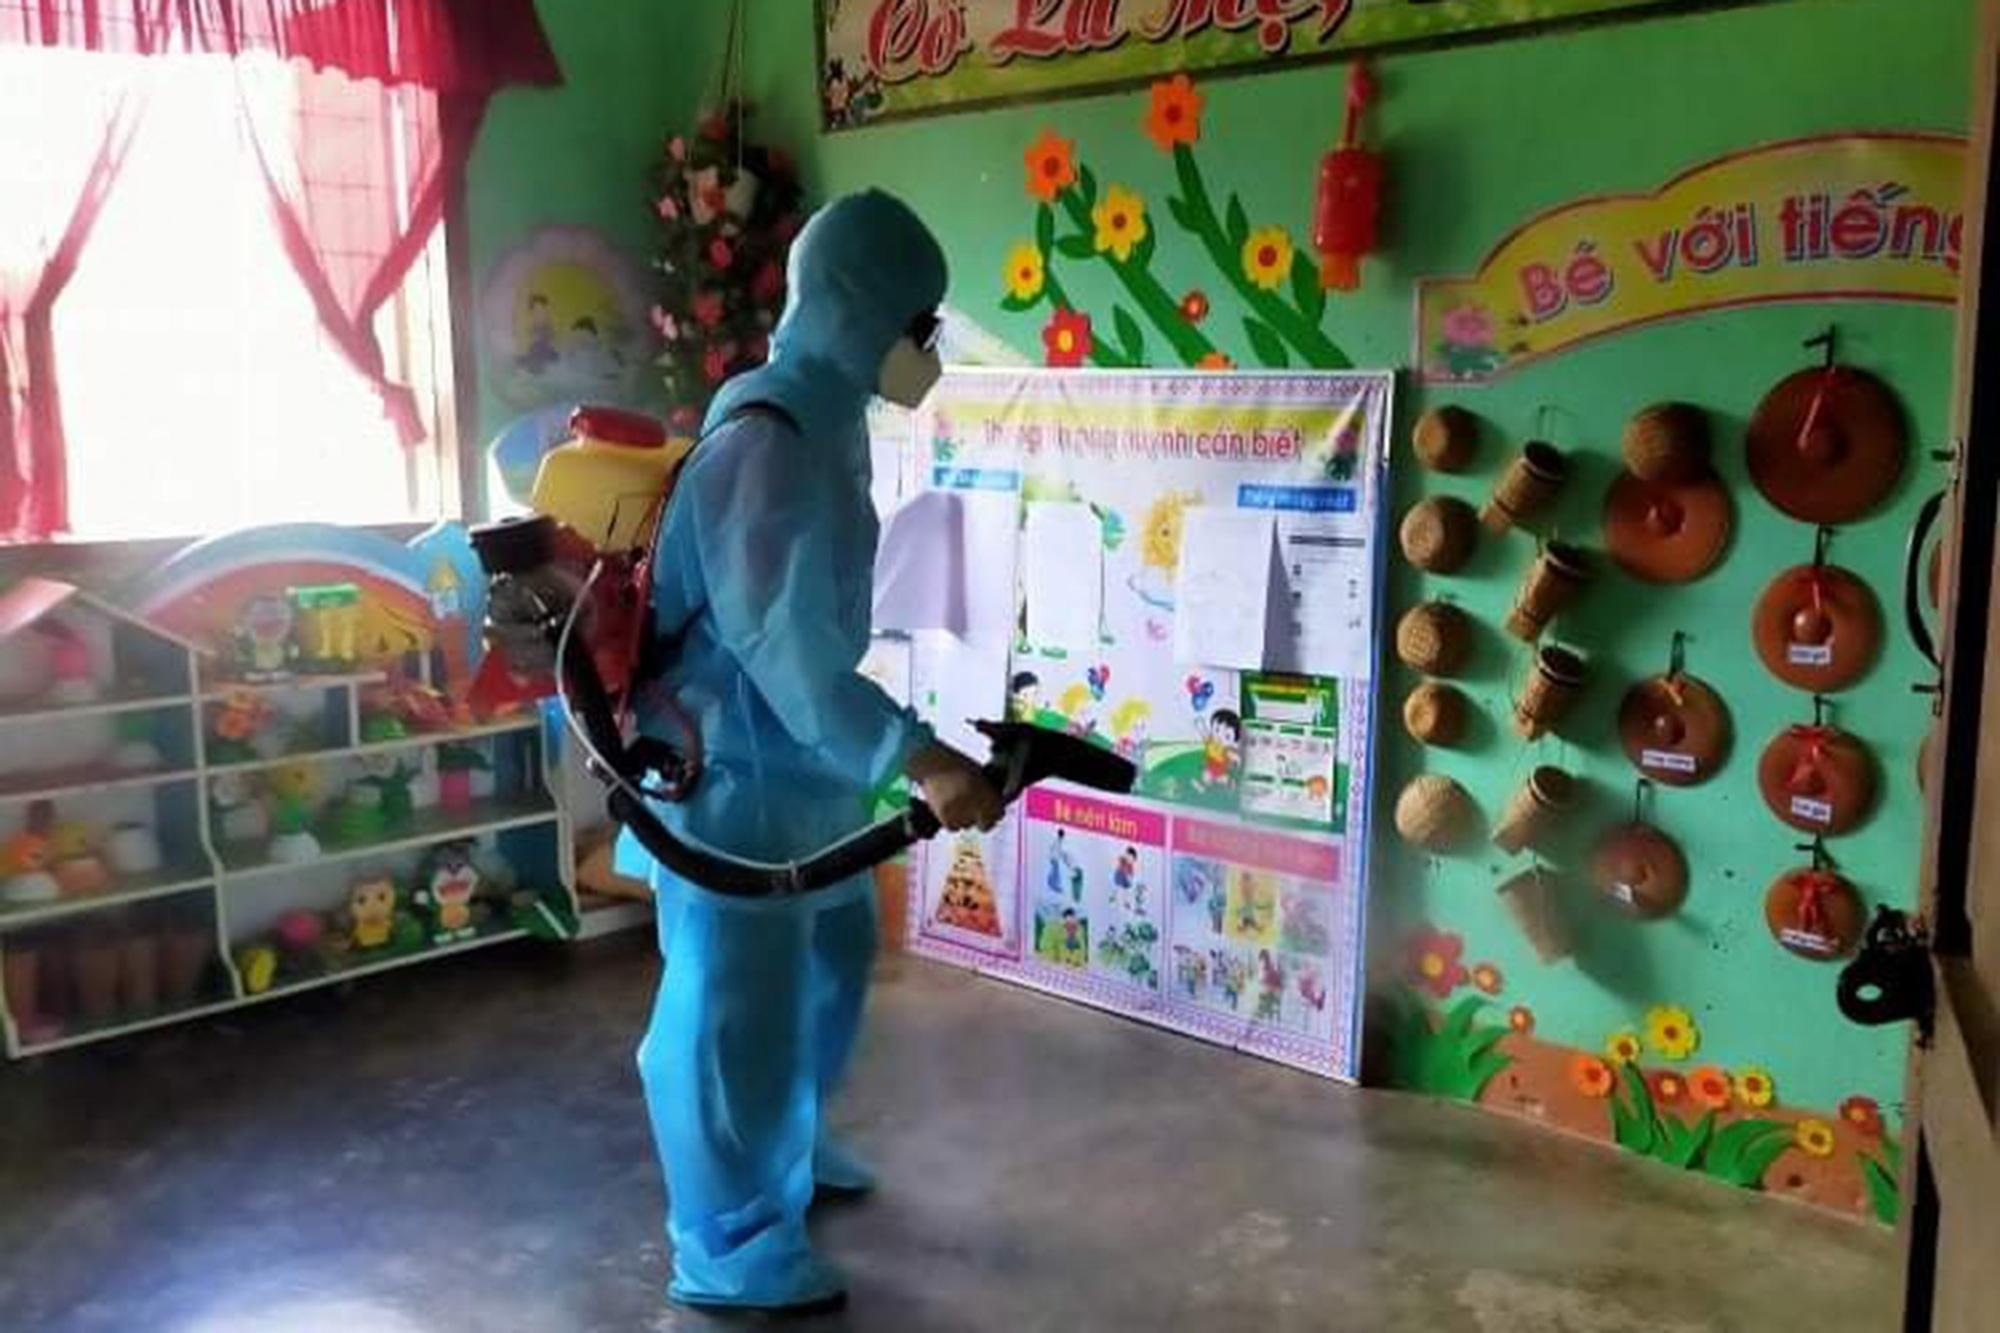 A health worker disinfects a kindergarten in Kon Tum Province, Vietnam, July 4, 2020. Photo: T.T.N. / Tuoi Tre